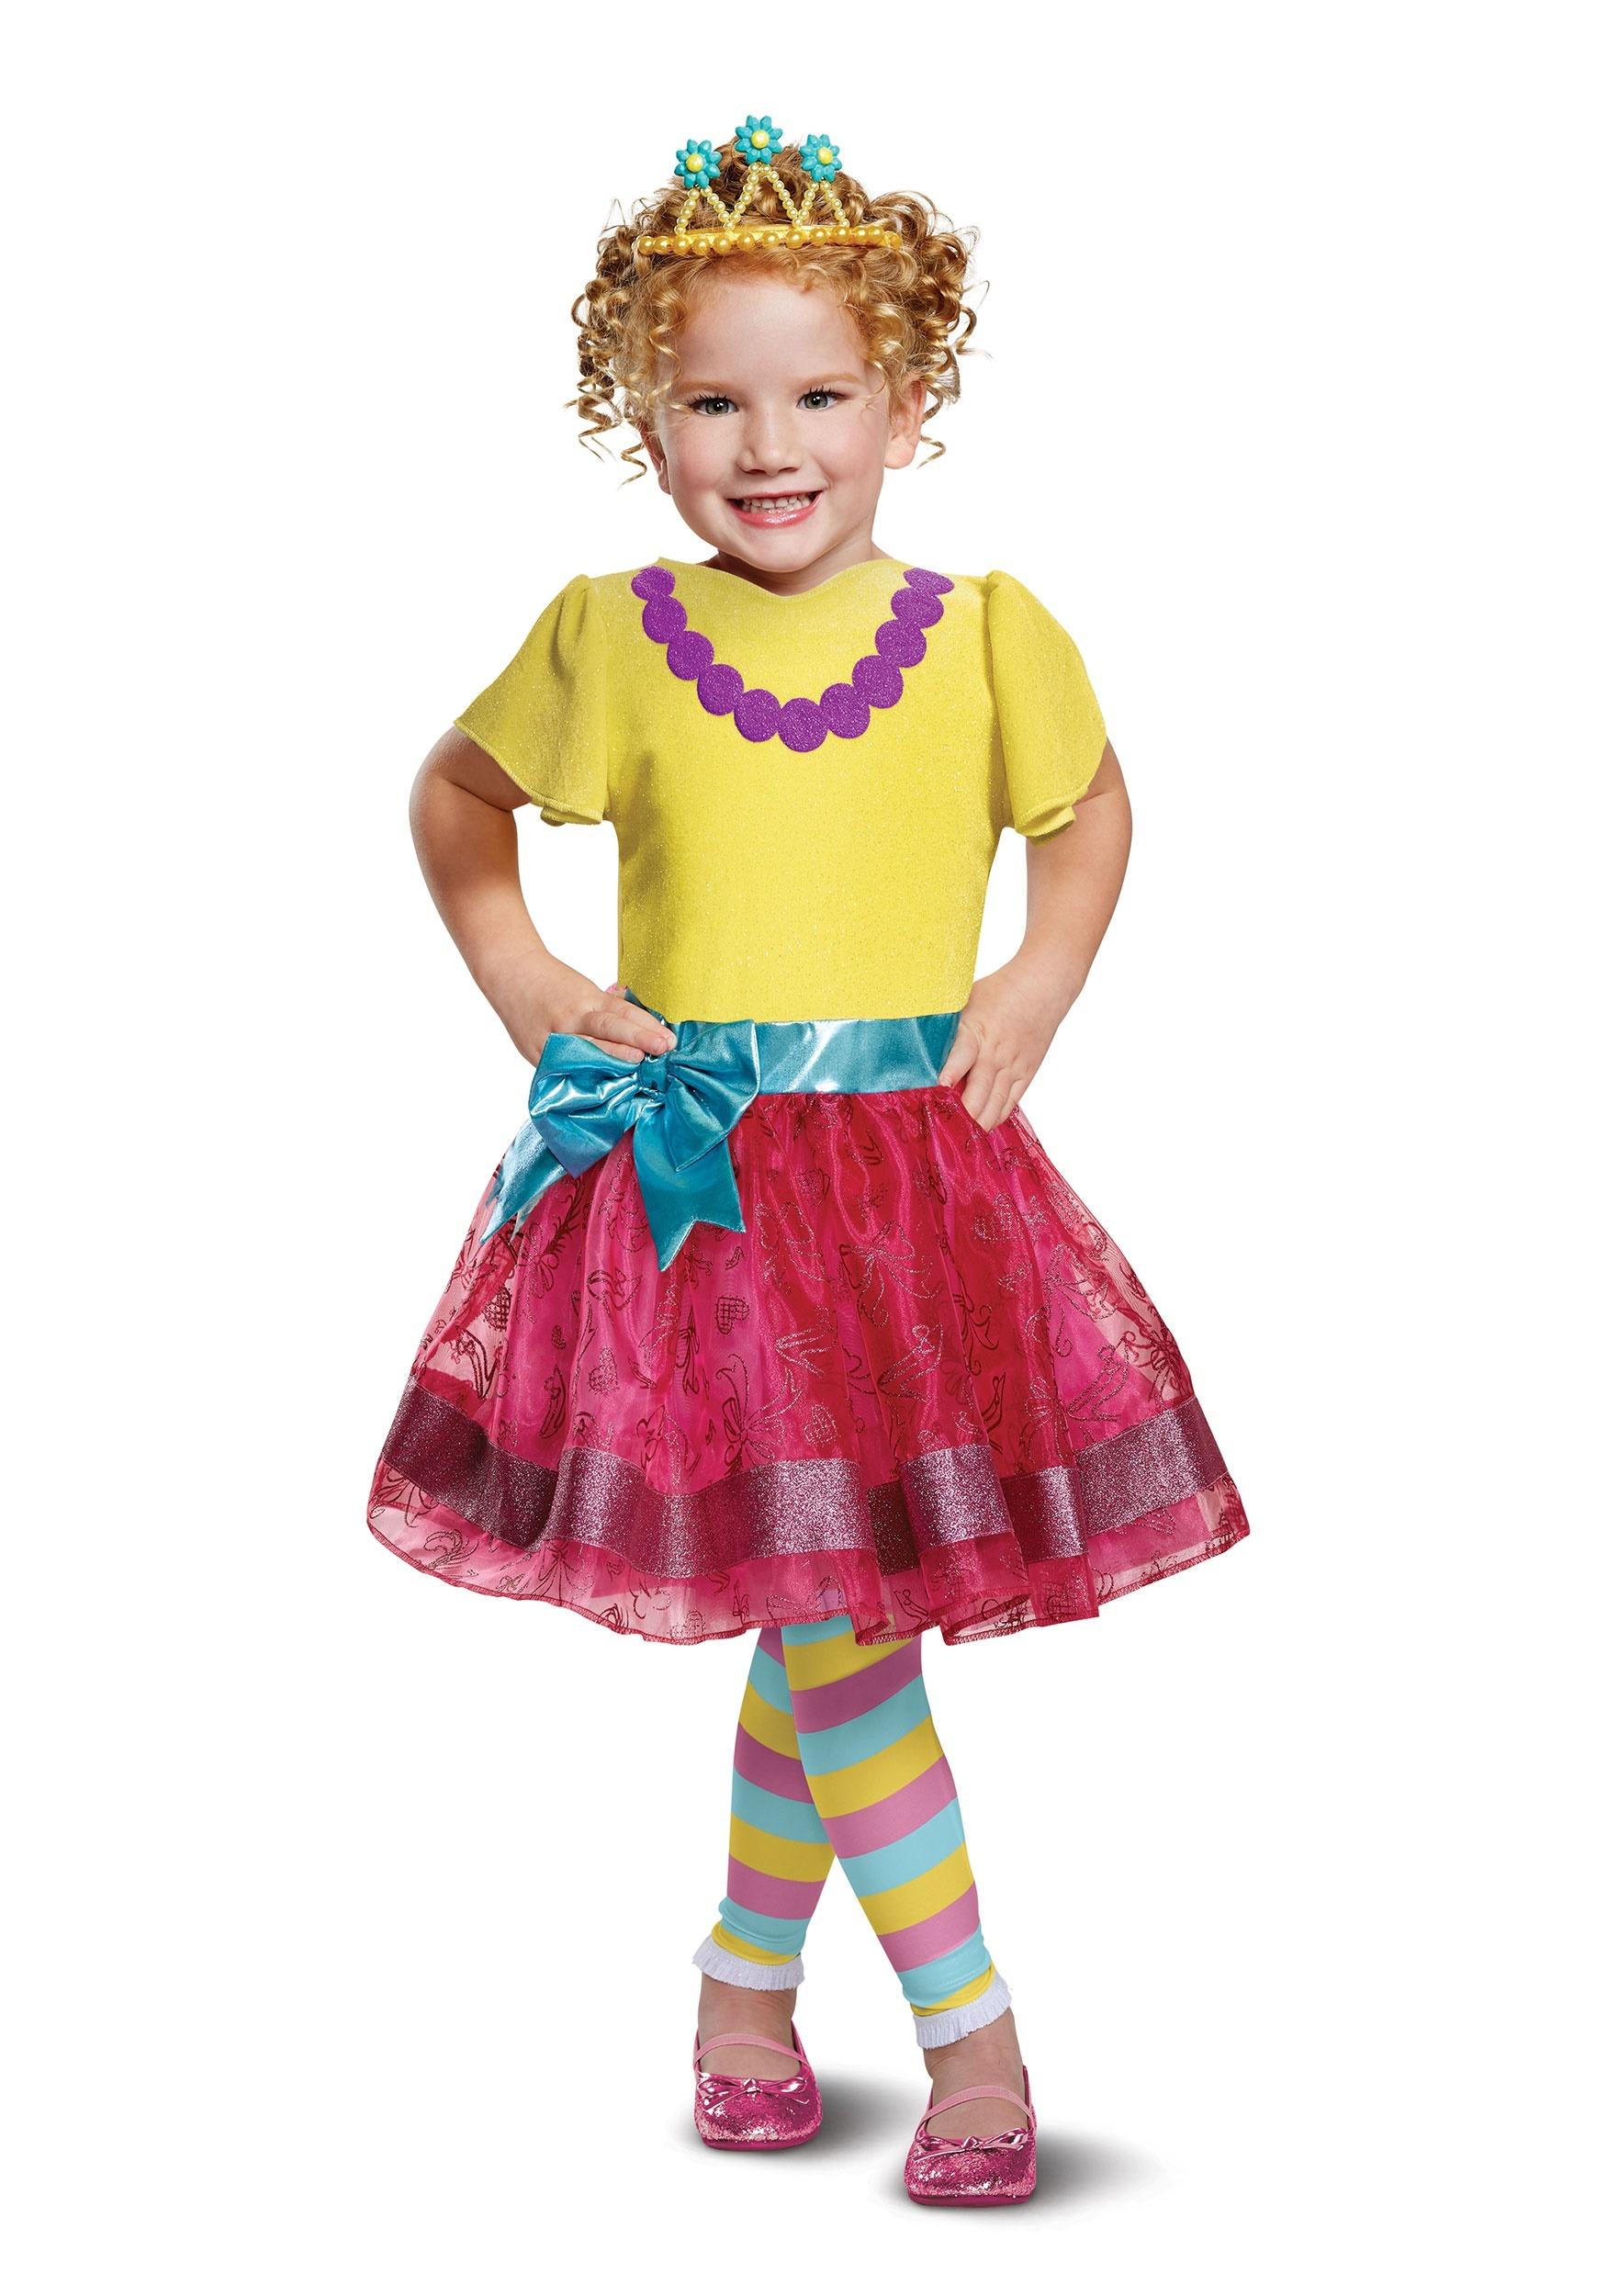 hight resolution of girlu0027s deluxe fancy nancy costume sc 1 st halloween costumes